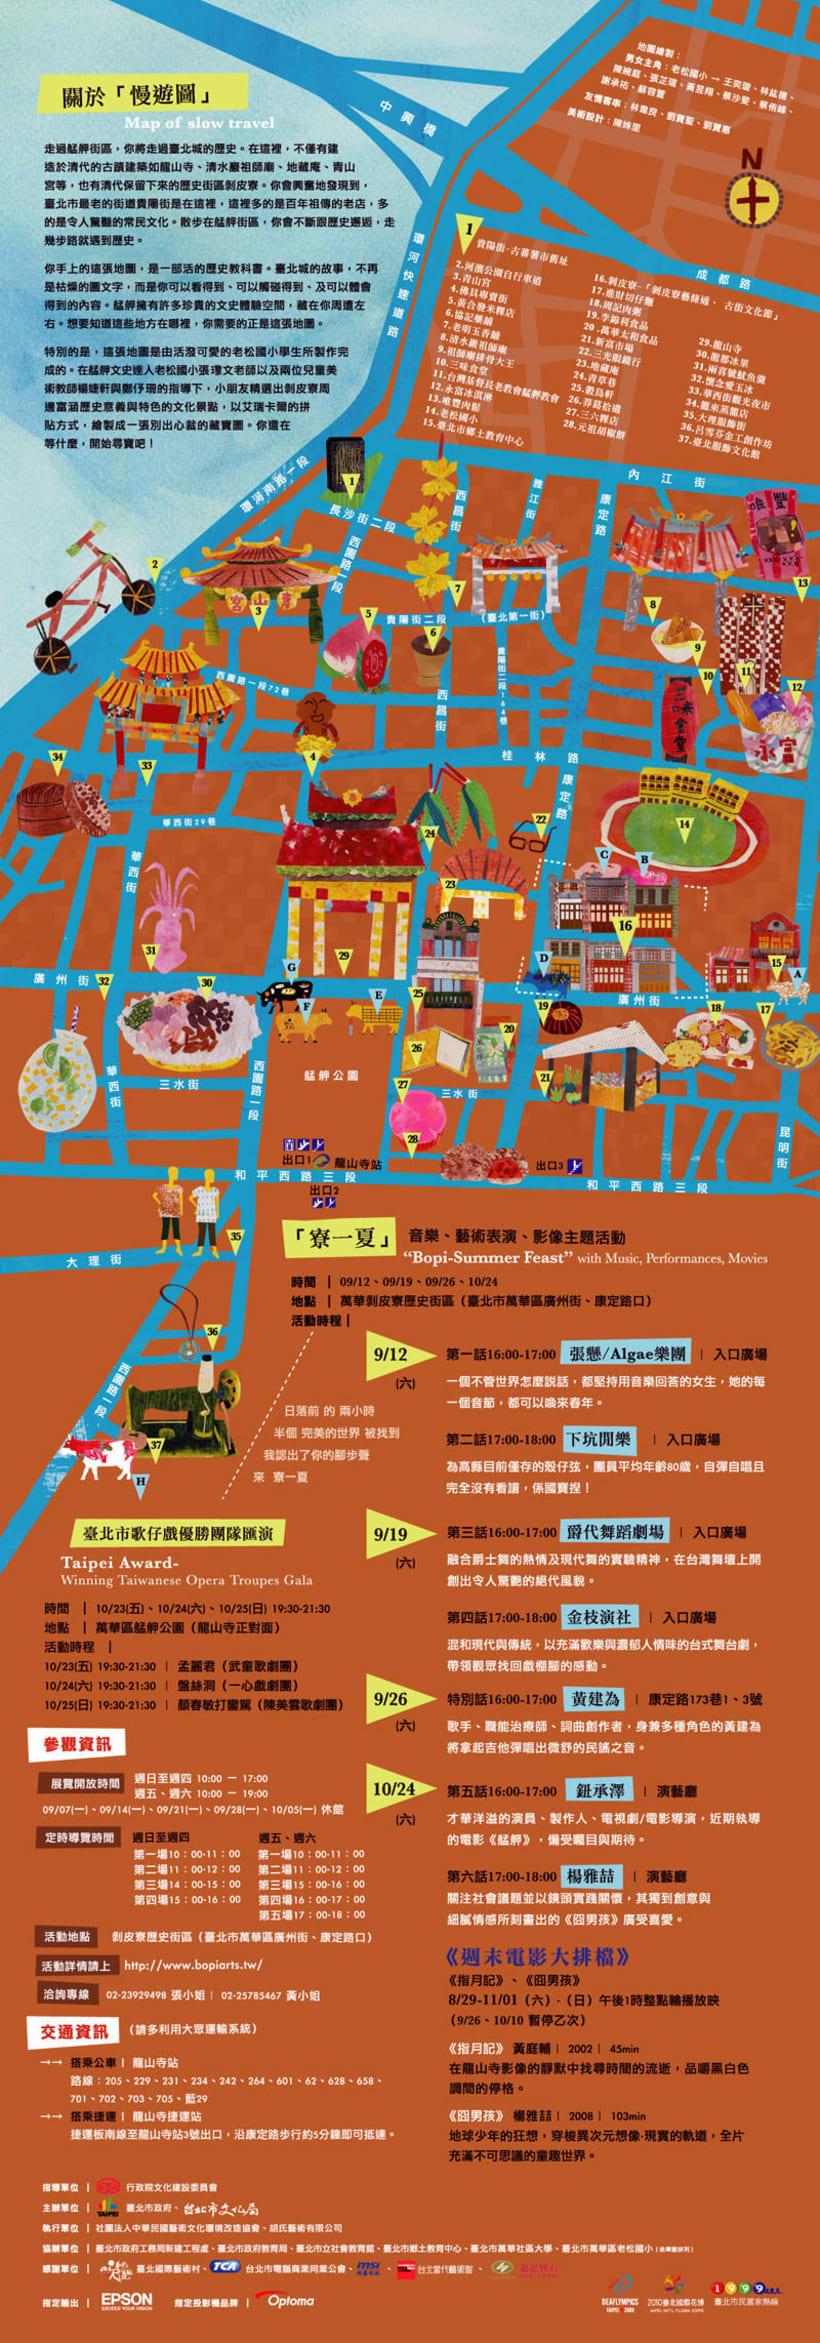 Bopi Art creative map 3